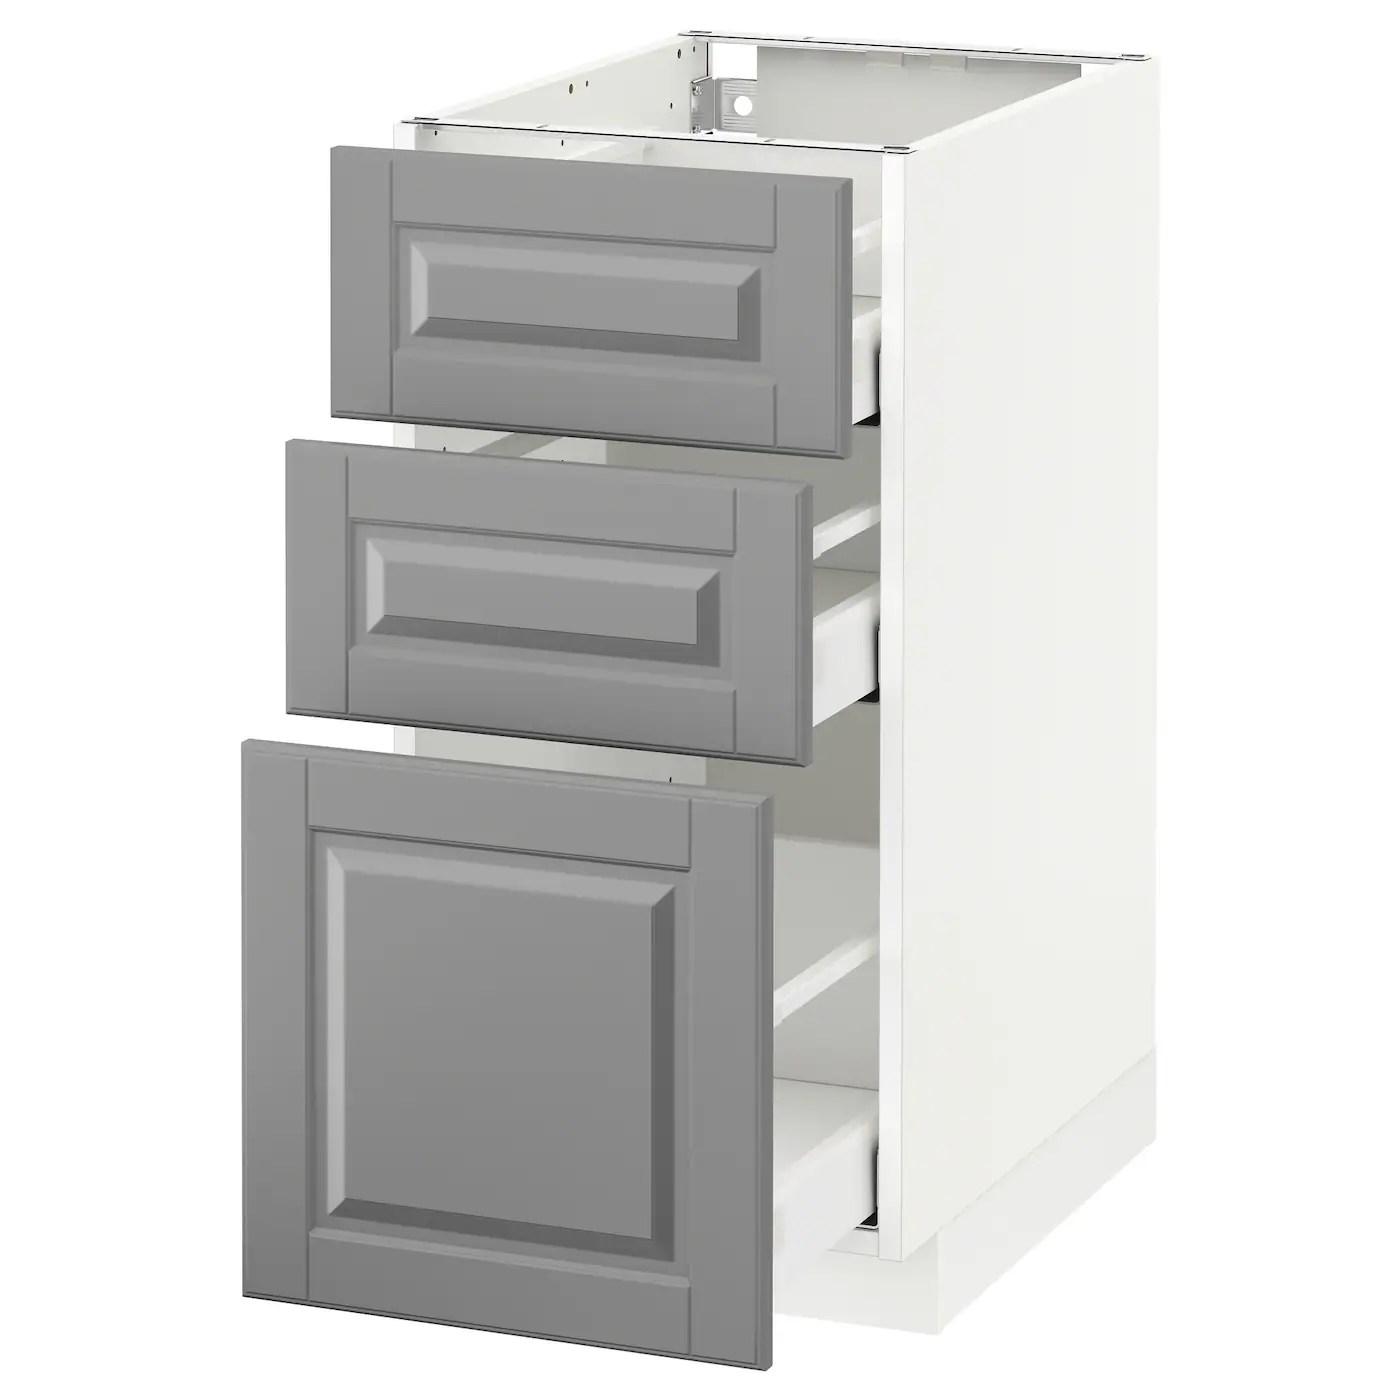 5 drawer kitchen base cabinet with pantry metod maximera 3 drawers white bodbyn